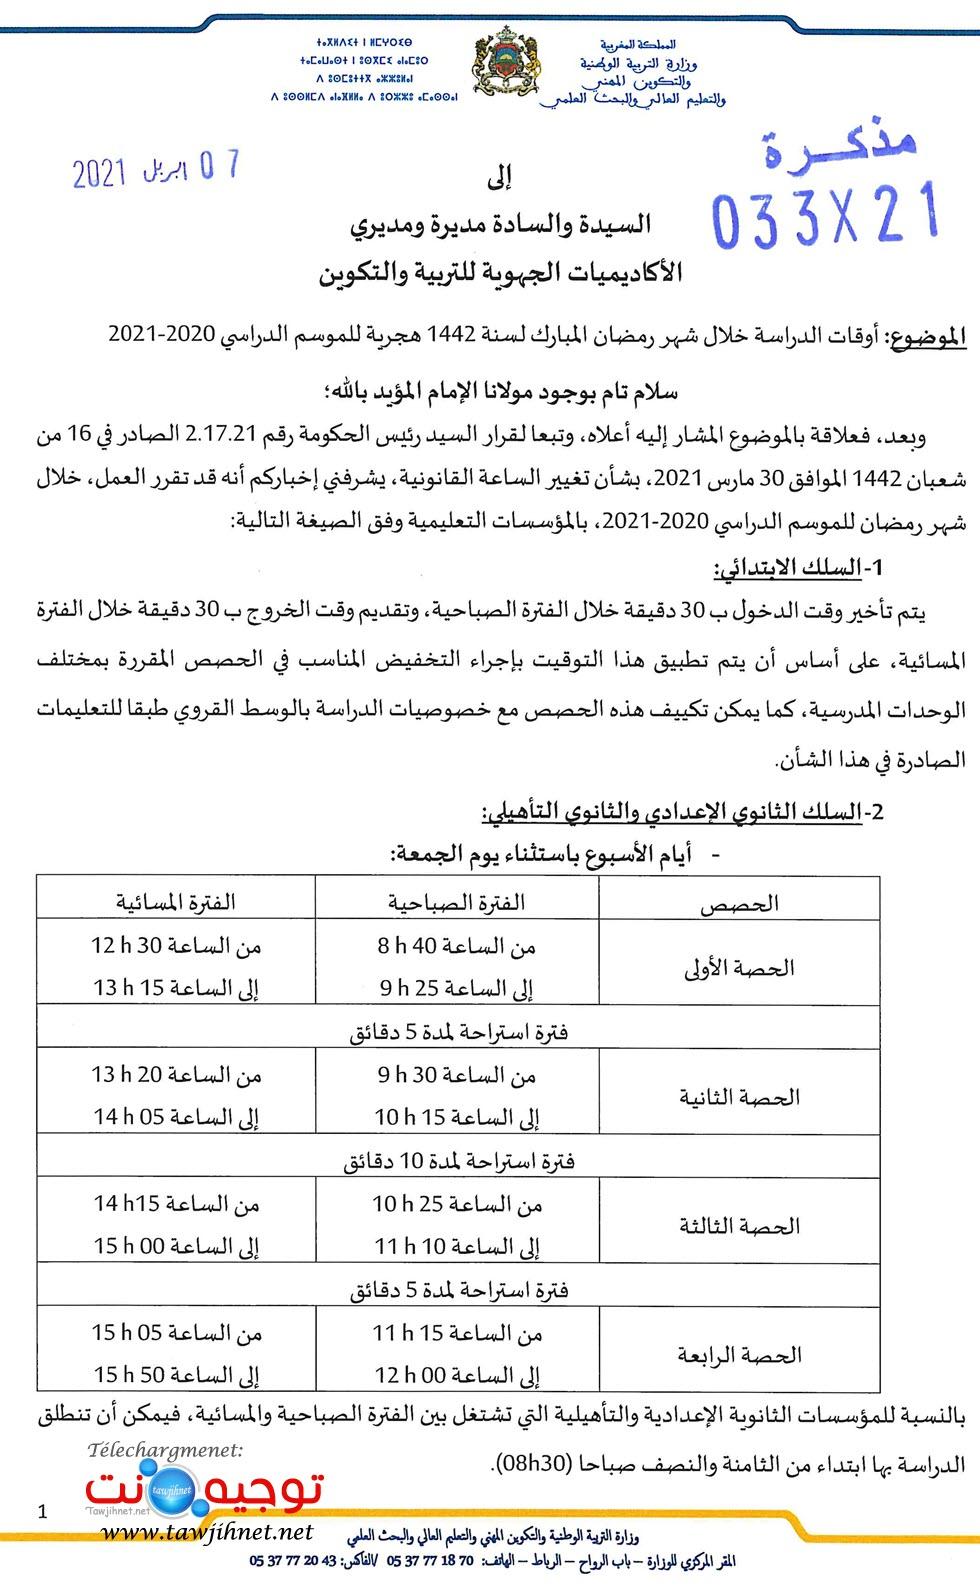 ramadan-Note-33-21-2021._Page_1.jpg